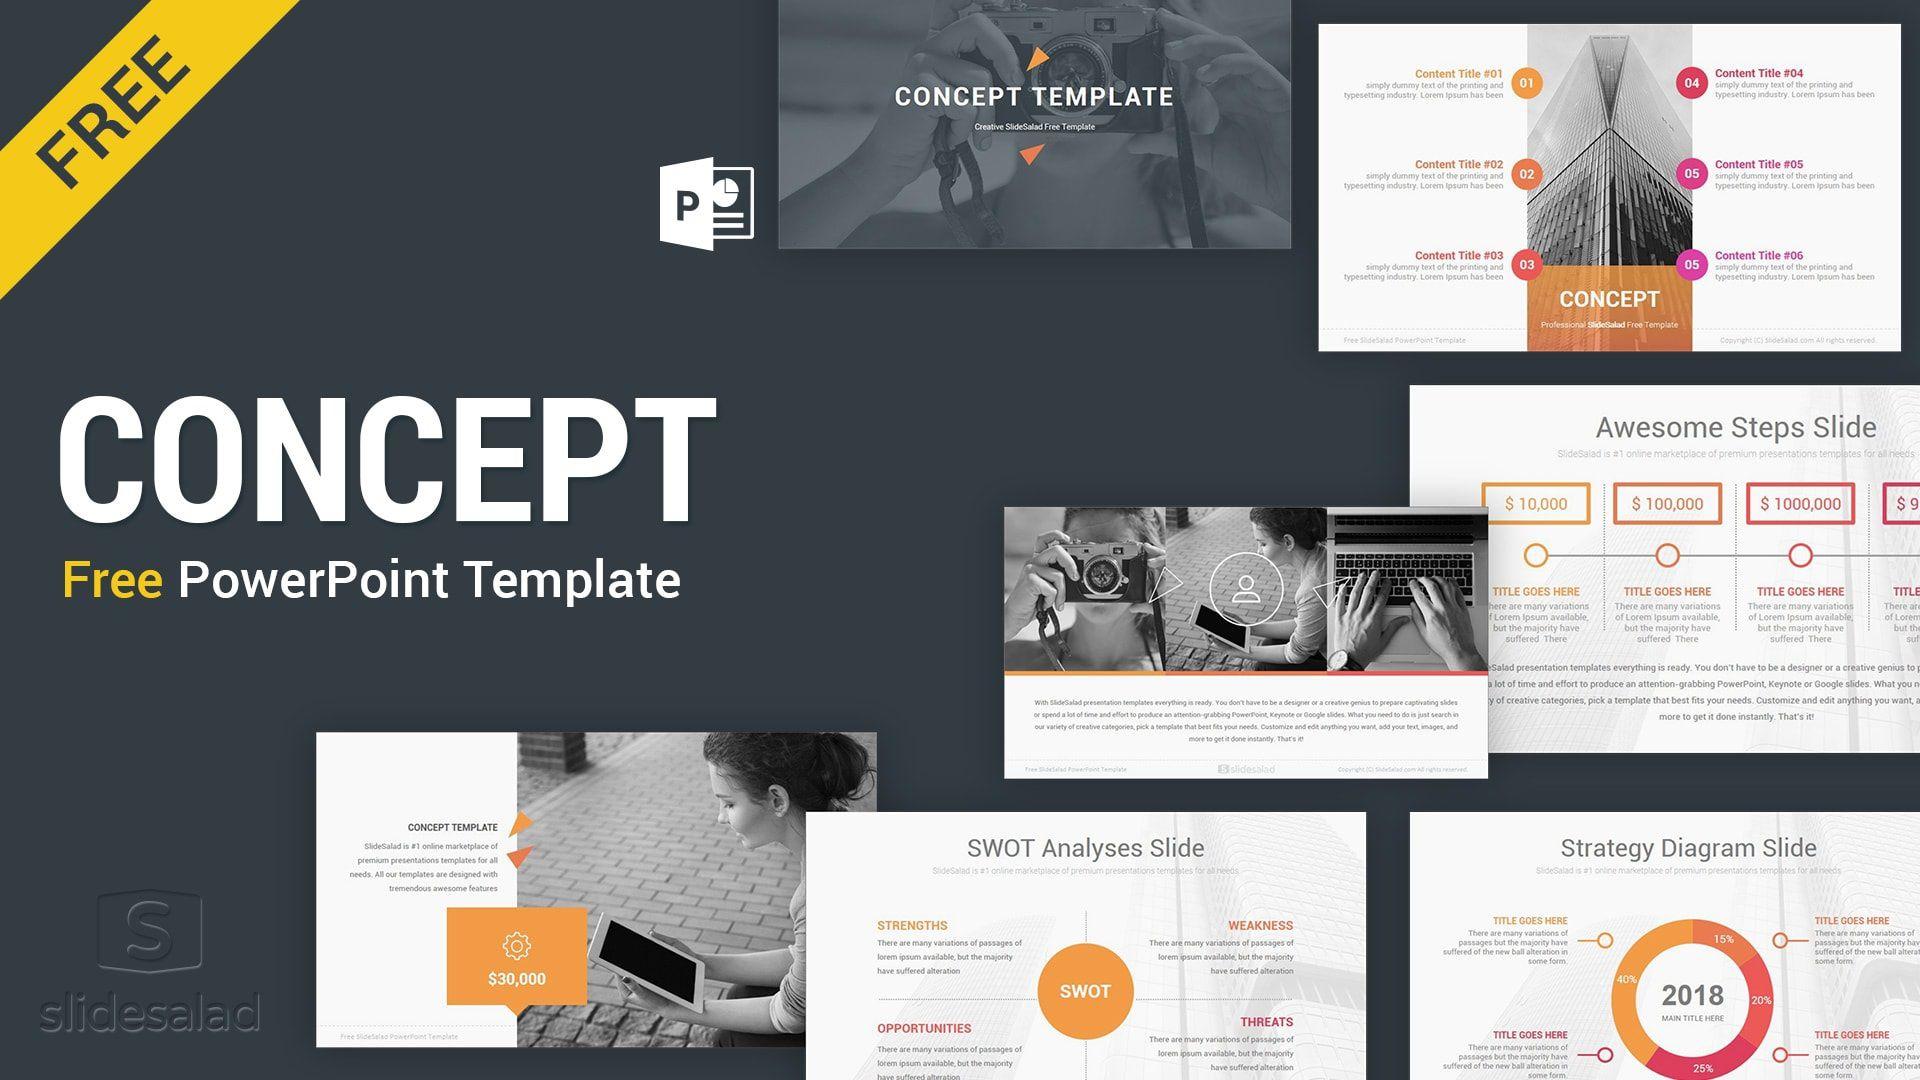 004 Singular Product Presentation Ppt Template Free Download Design Full